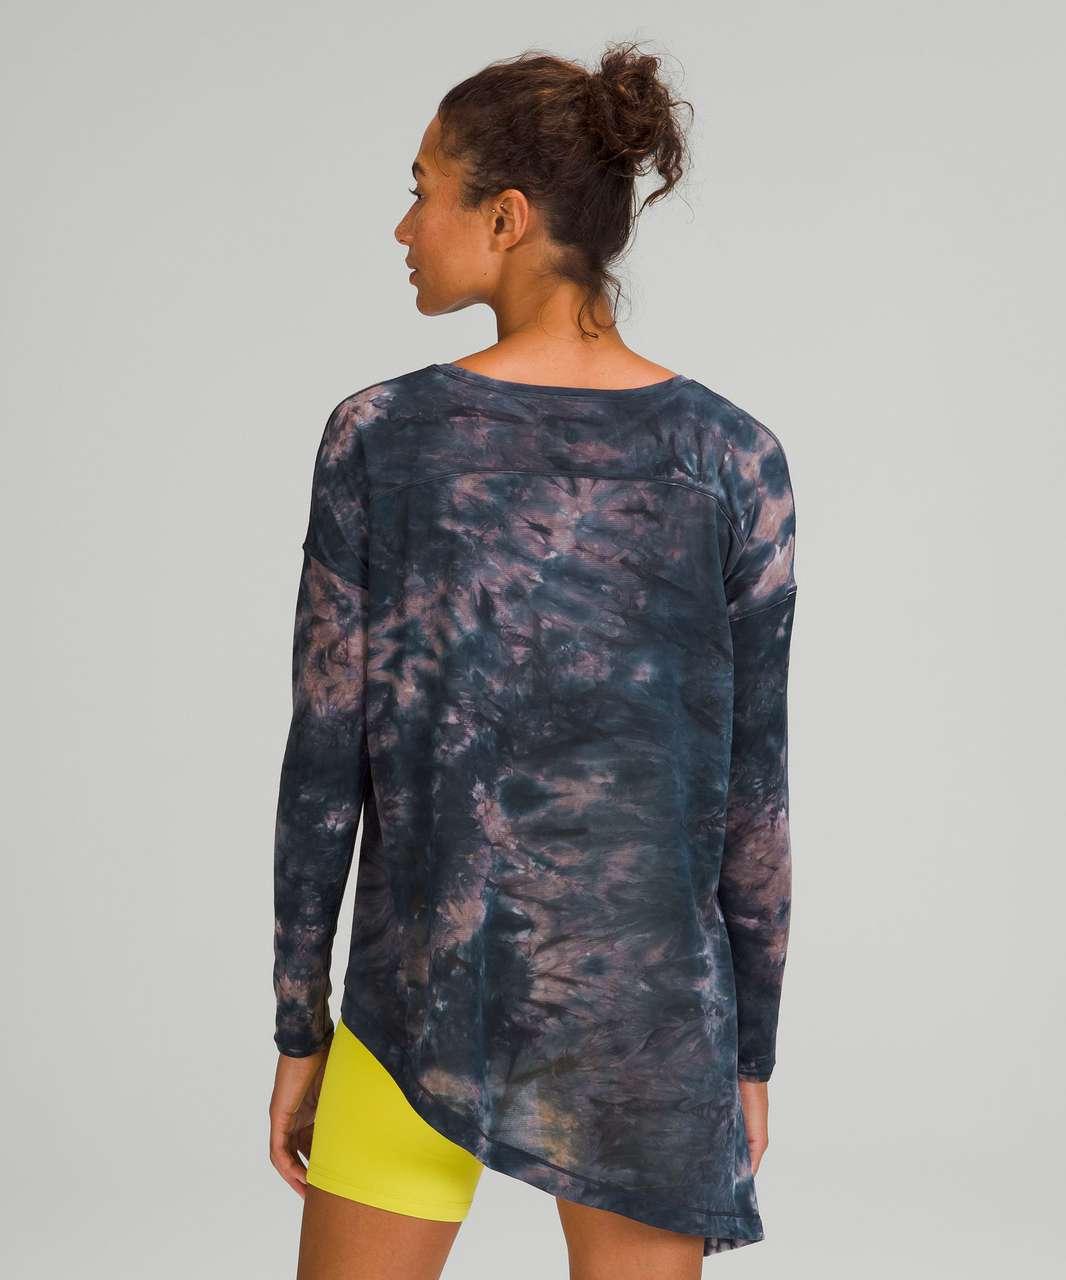 Lululemon To The Point Long Sleeve *Mist - Spray Dye White Lunar Rock True Navy